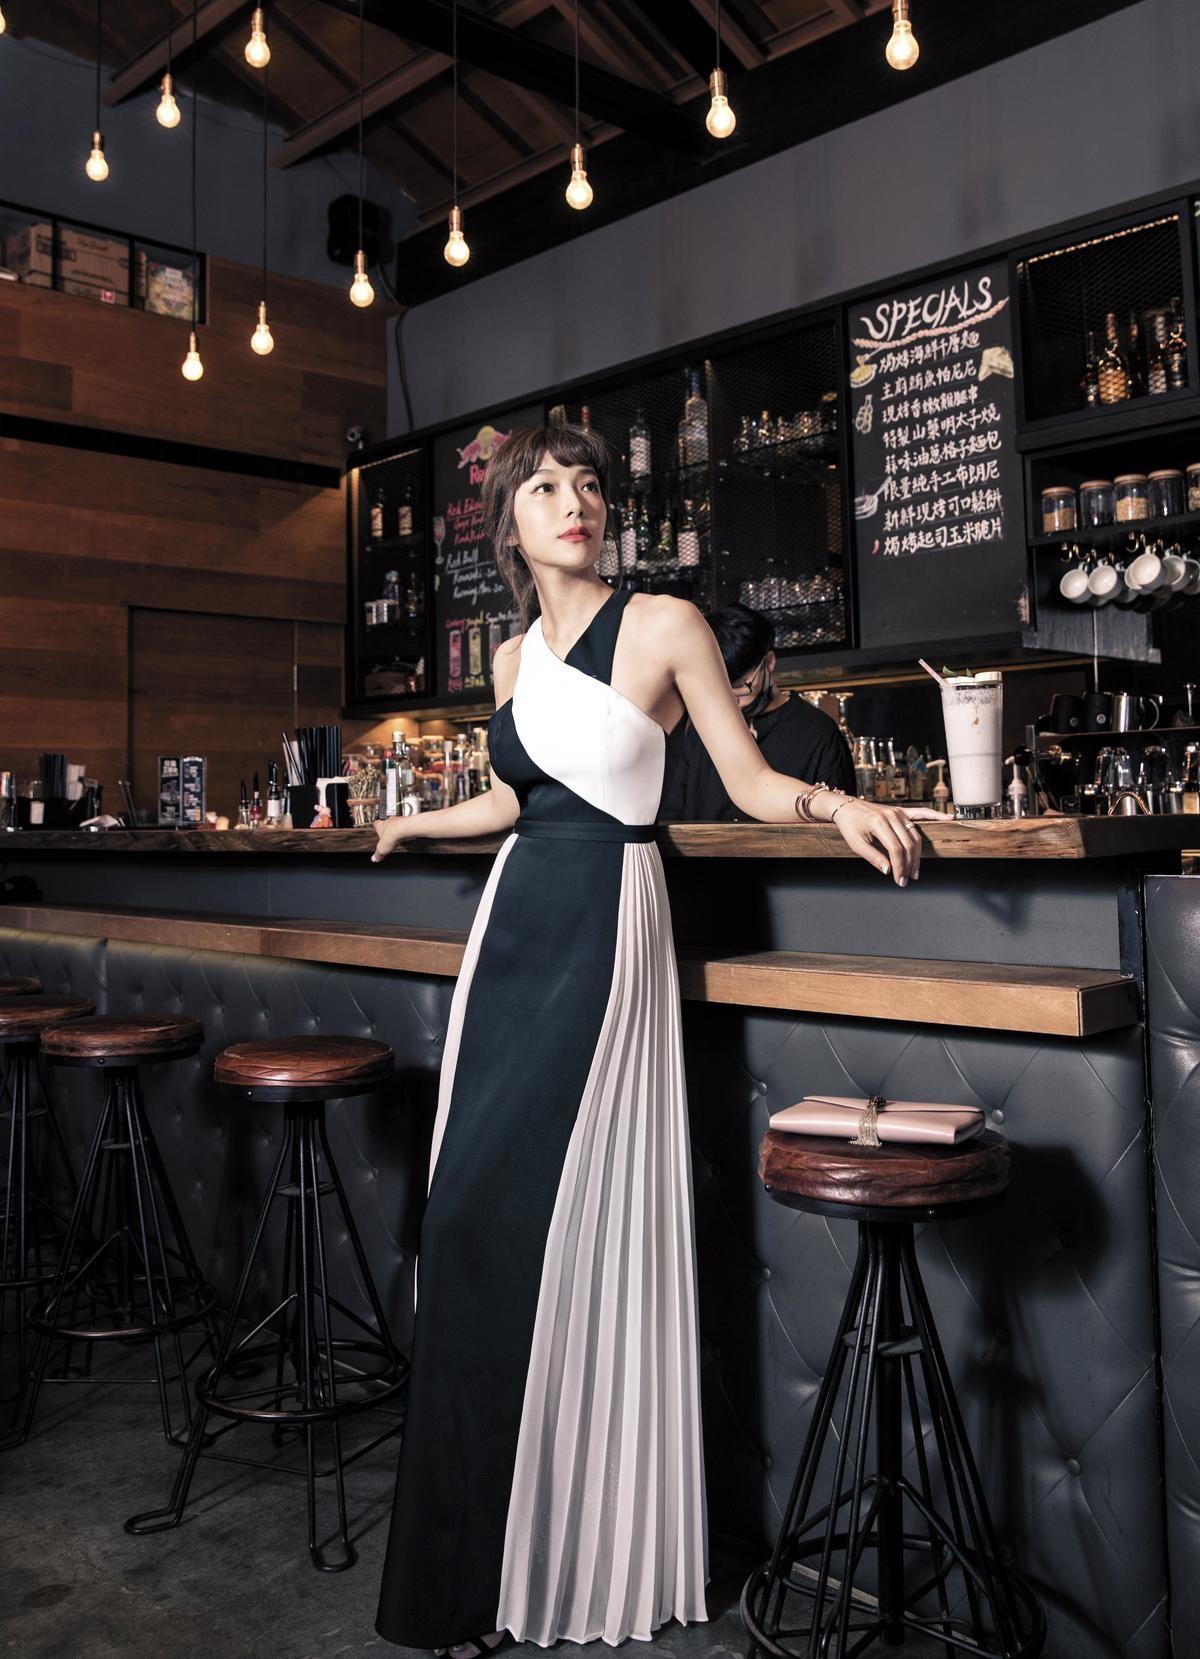 BCBGMAXAZRIA 黑白褶飾晚裝。 NT$21,900|PIAGET Possession 旋轉系列手鐲。 各約NT$111,000至 NT$359,000不等